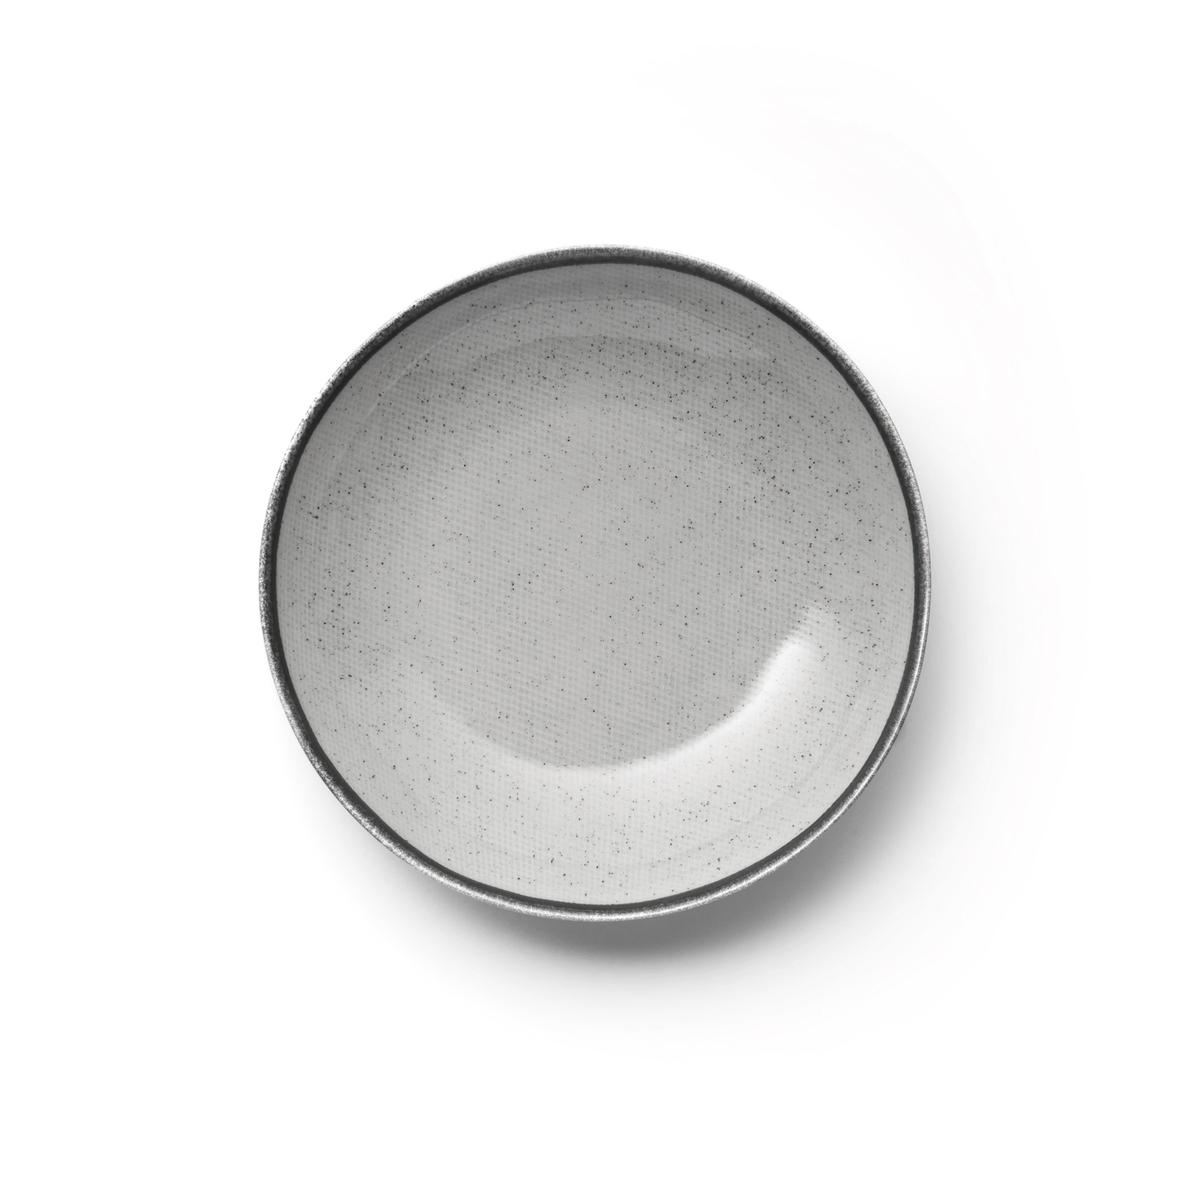 Anika Enamelled Stoneware Soup Bowls (Set of 4)